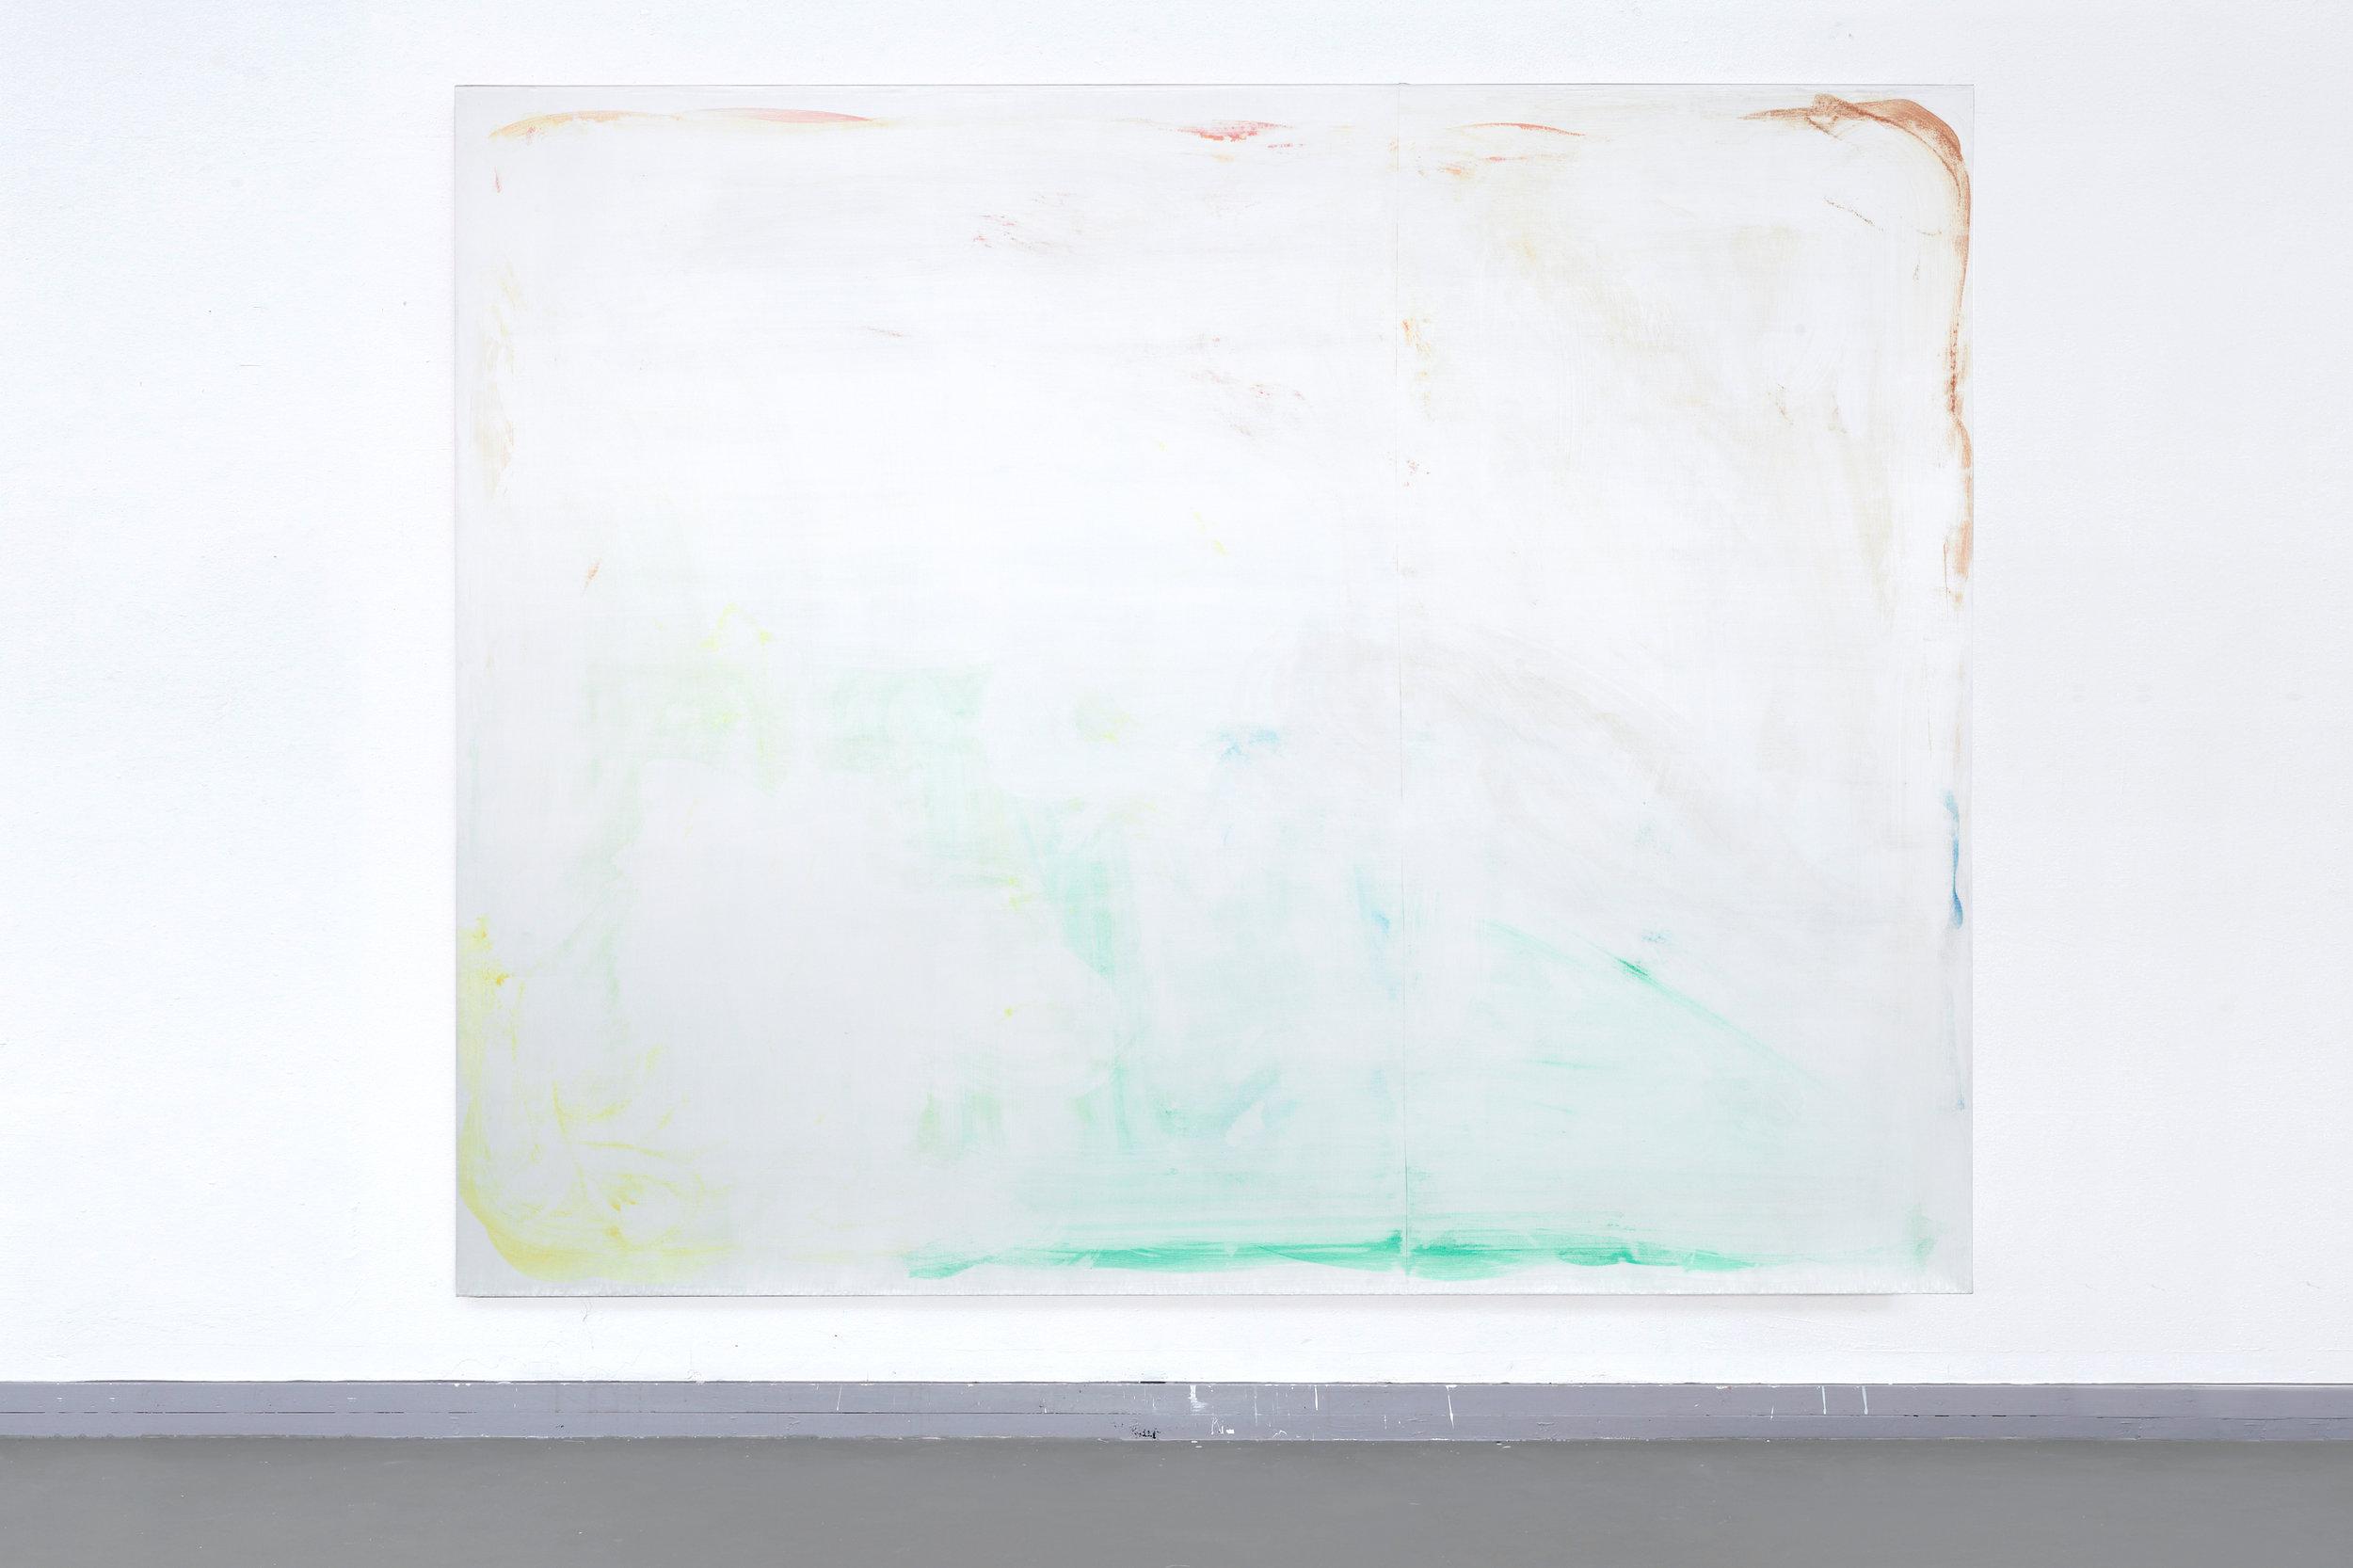 Poetsdoek 2 (Mob) - Egg-tempera, Vanish Oxi Action on canvas, 250 x 200 cm, 2017